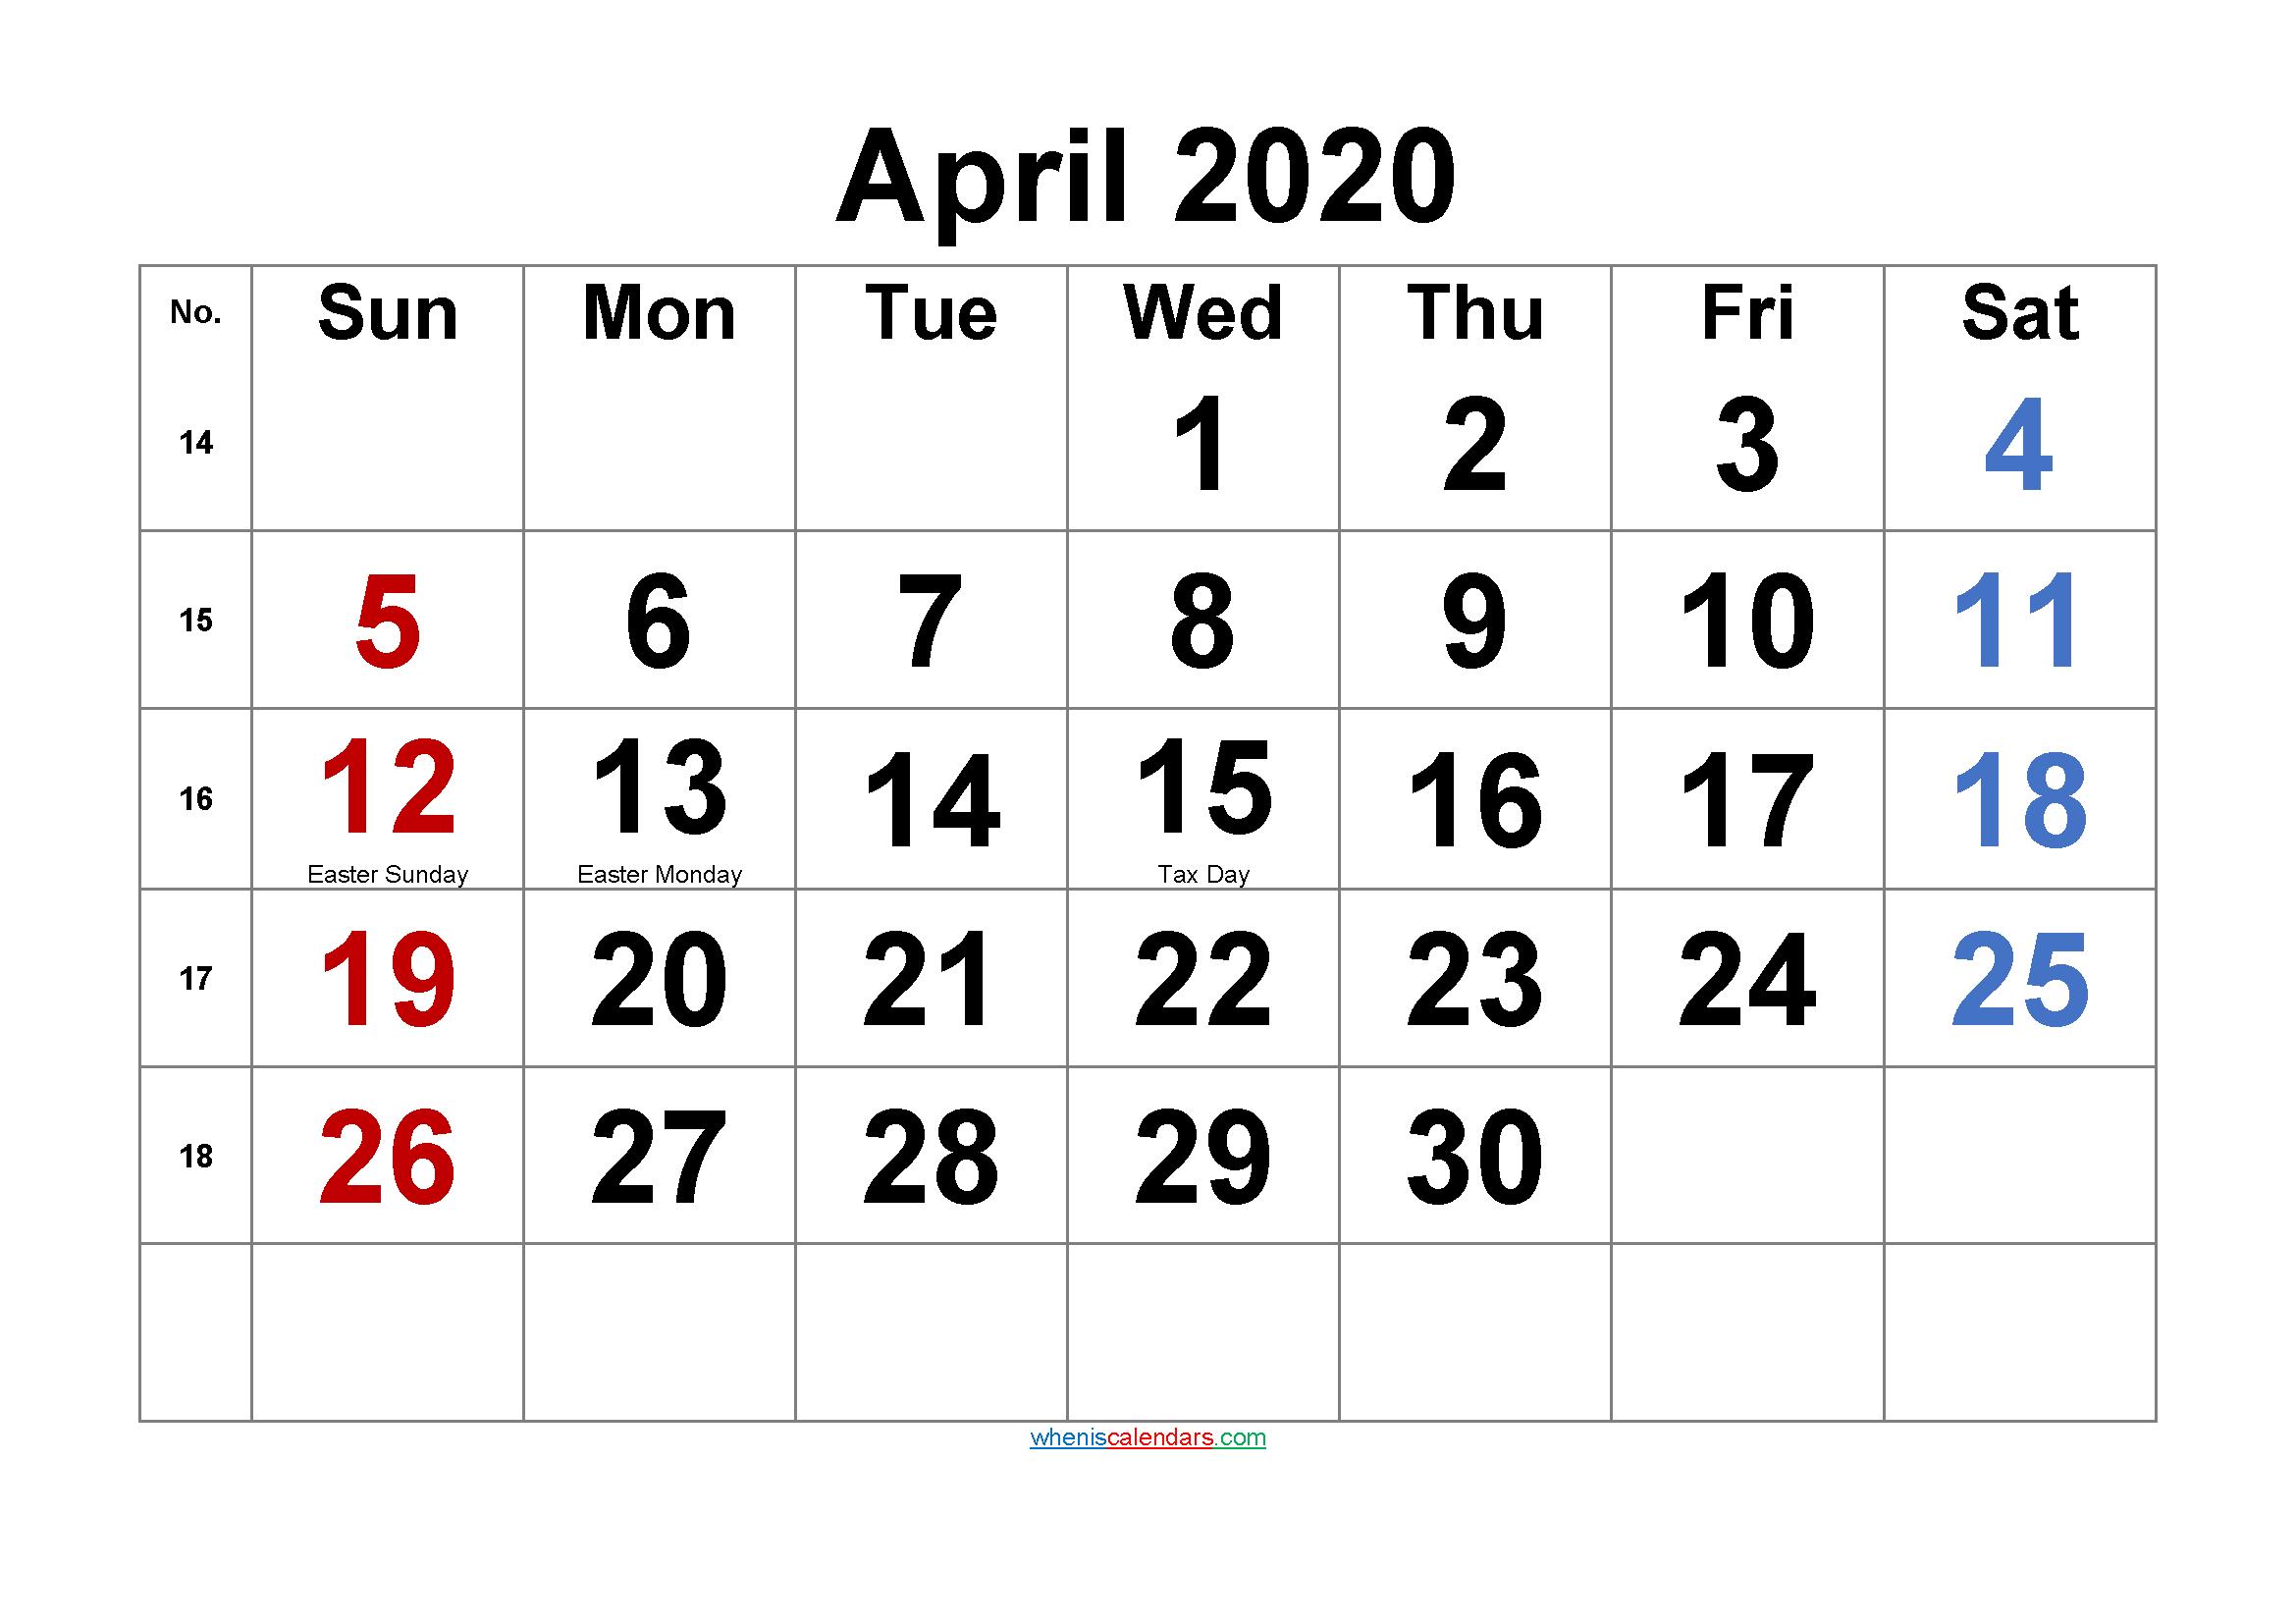 Free Printable April 2020 Calendar with Holidays